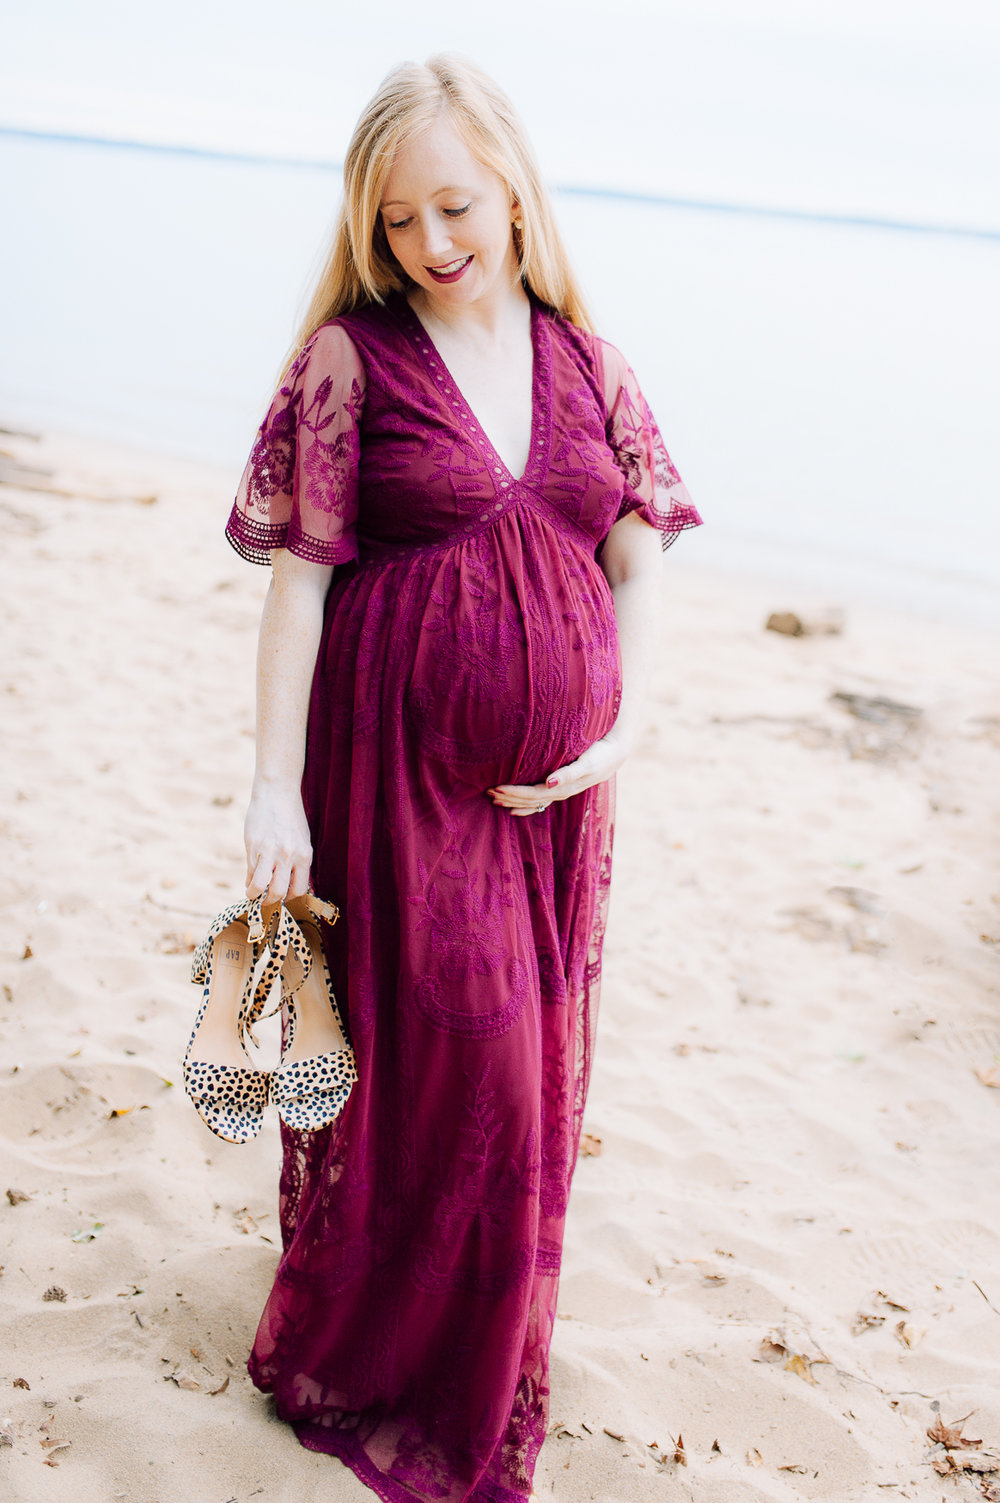 maternity_fallphotos_fredericksburgphotographer_leesylvania_youseephotography_Heather (58).jpg